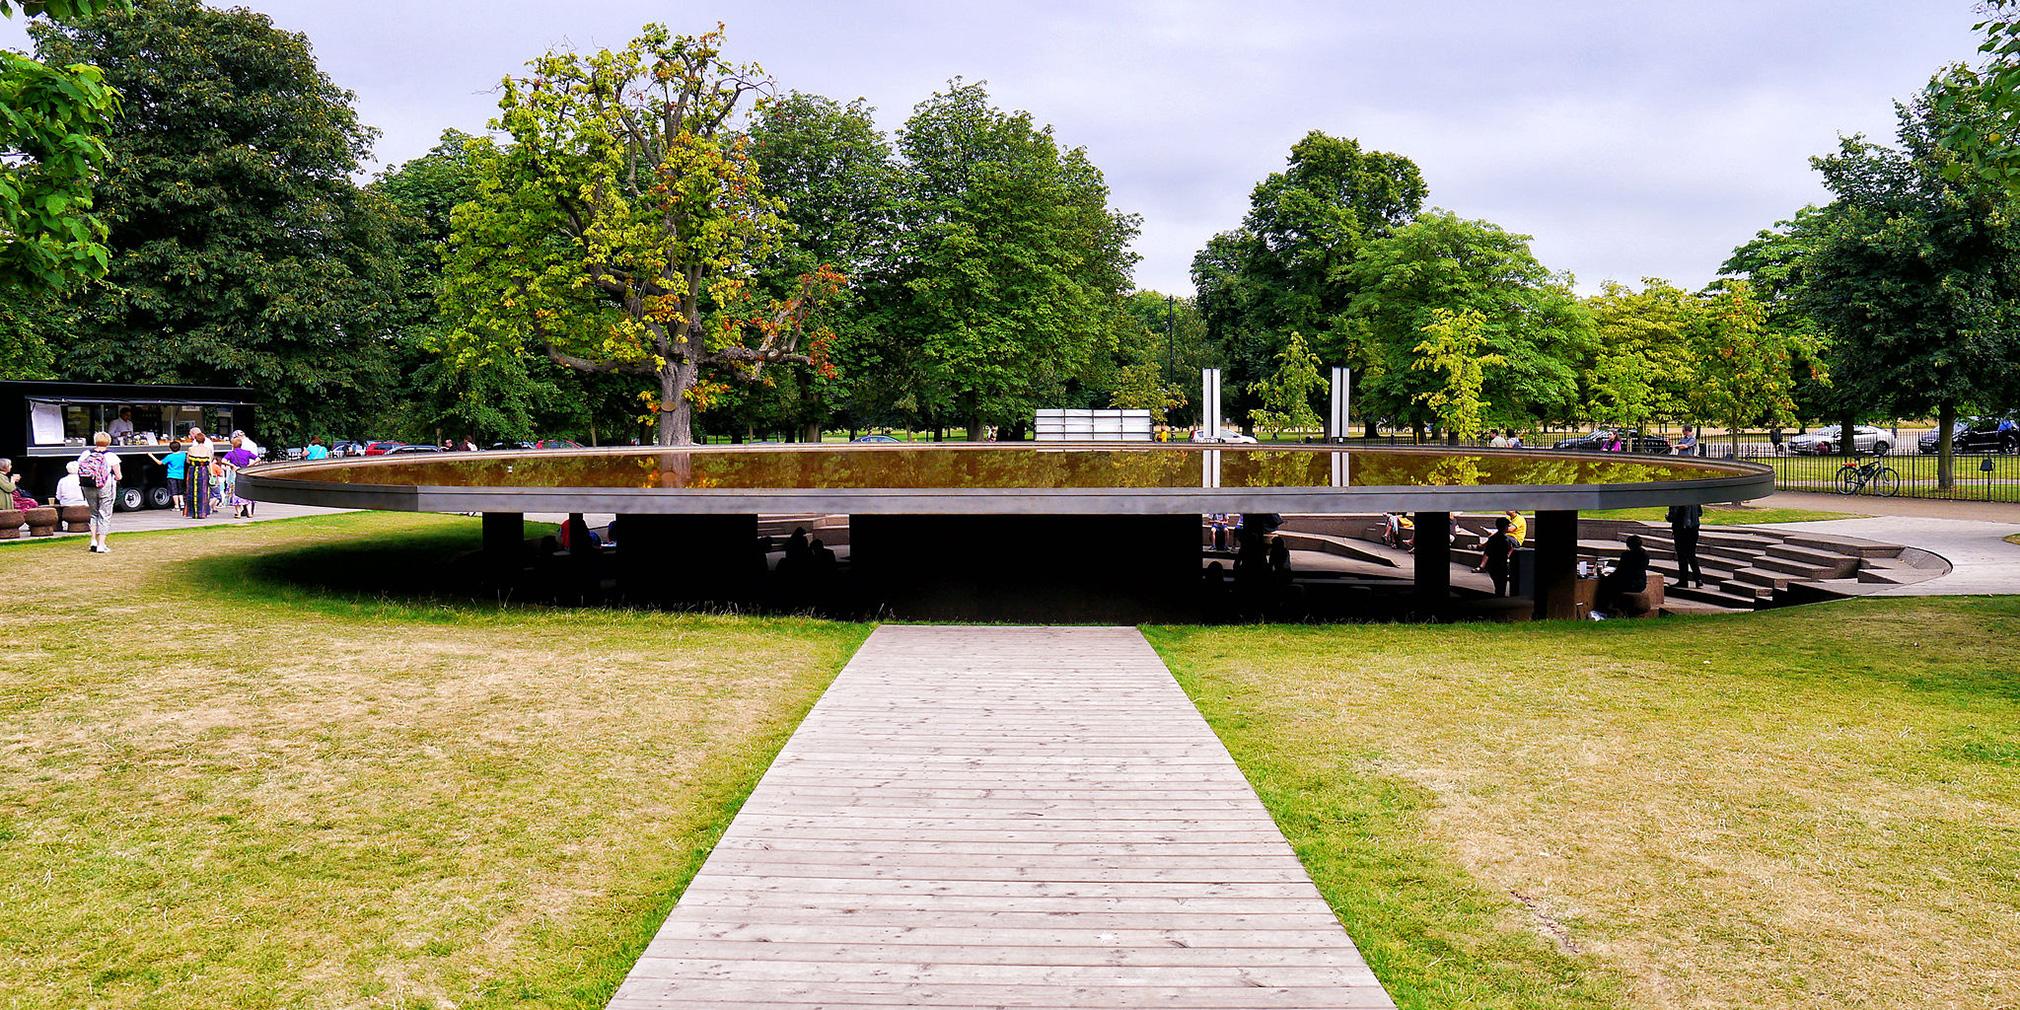 Ai Wewei and Herzog & de Meuron's 2012 Serpentine Gallery Pavilion